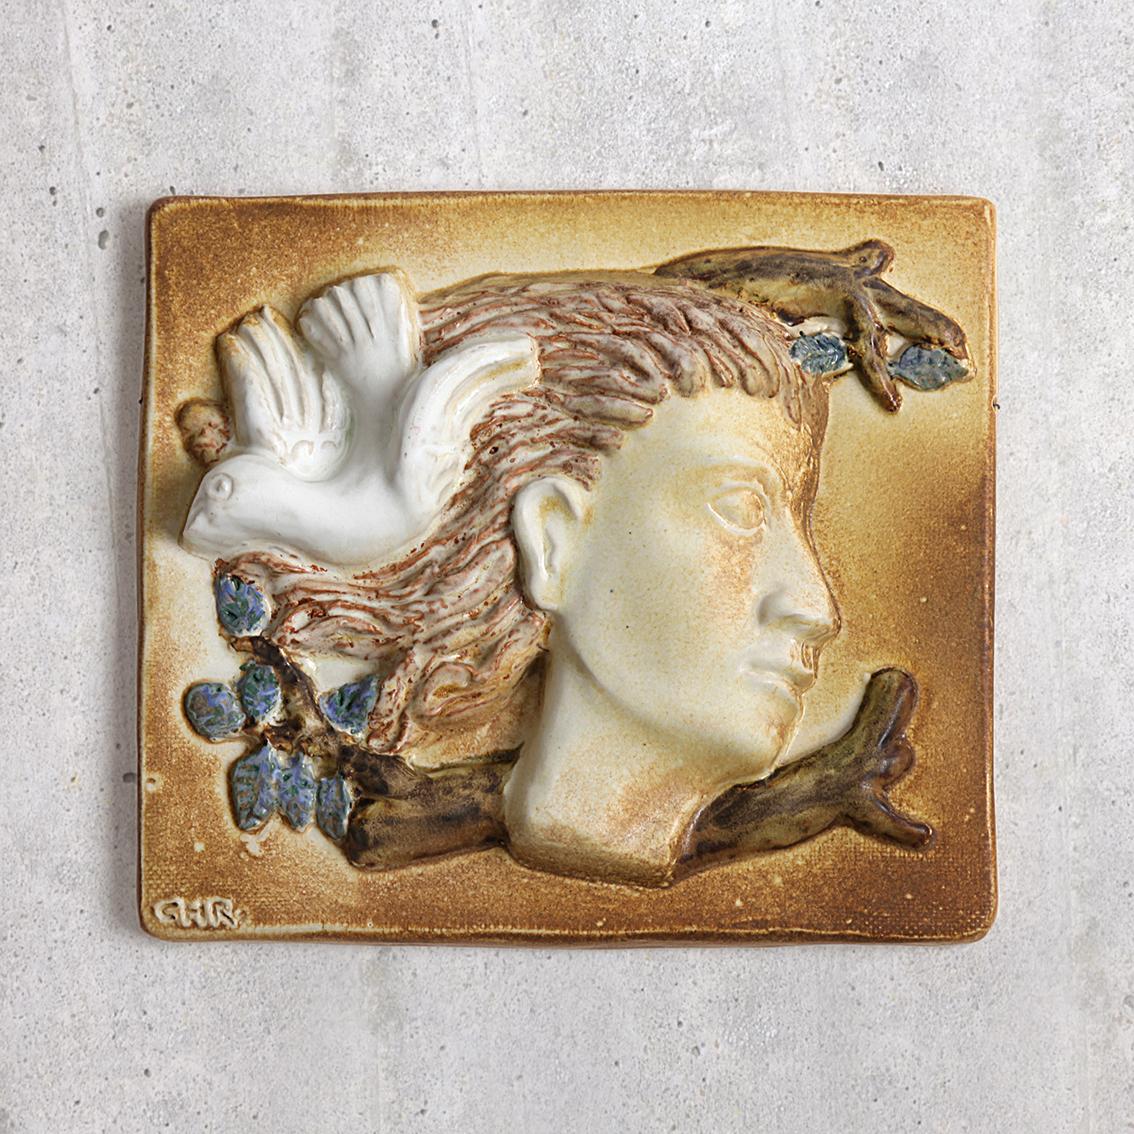 Christian Thorup クリスチャン トールップ鳩と青年の陶板 北欧ヴィンテージ